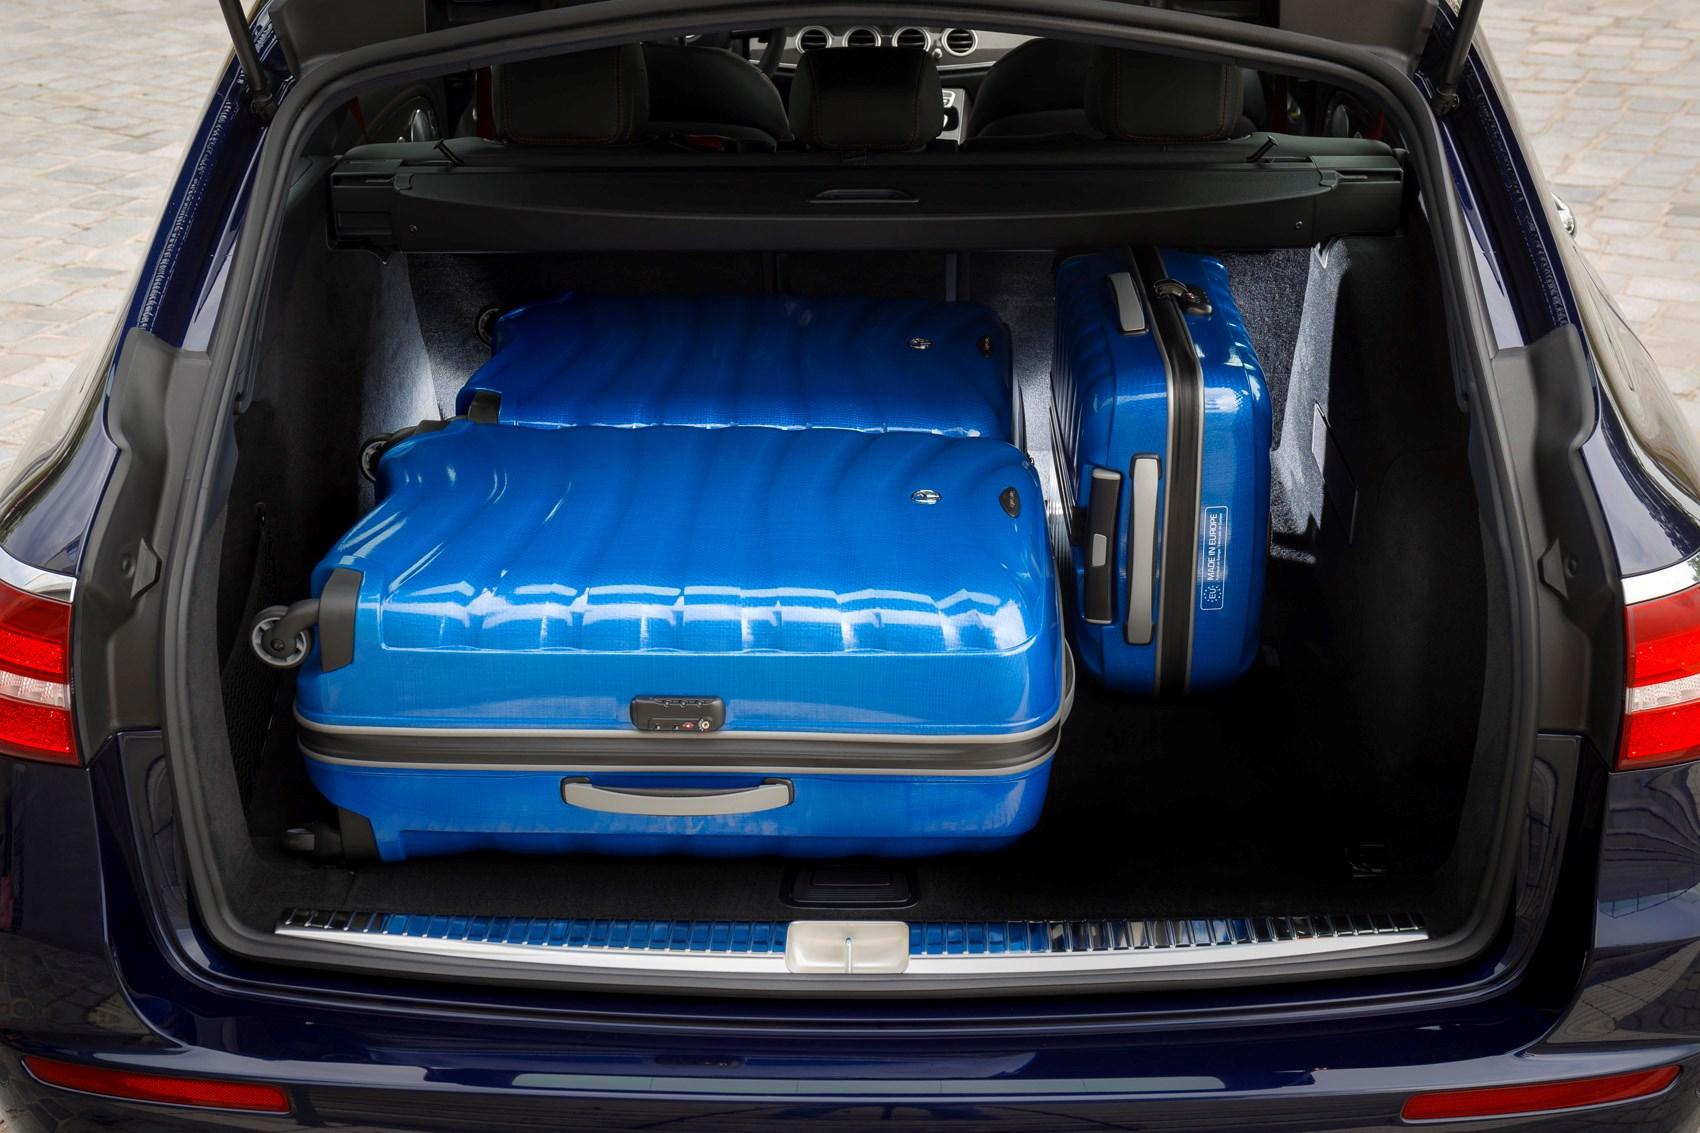 Mercedes benz e class estate review 2016 parkers for Mercedes benz suitcase